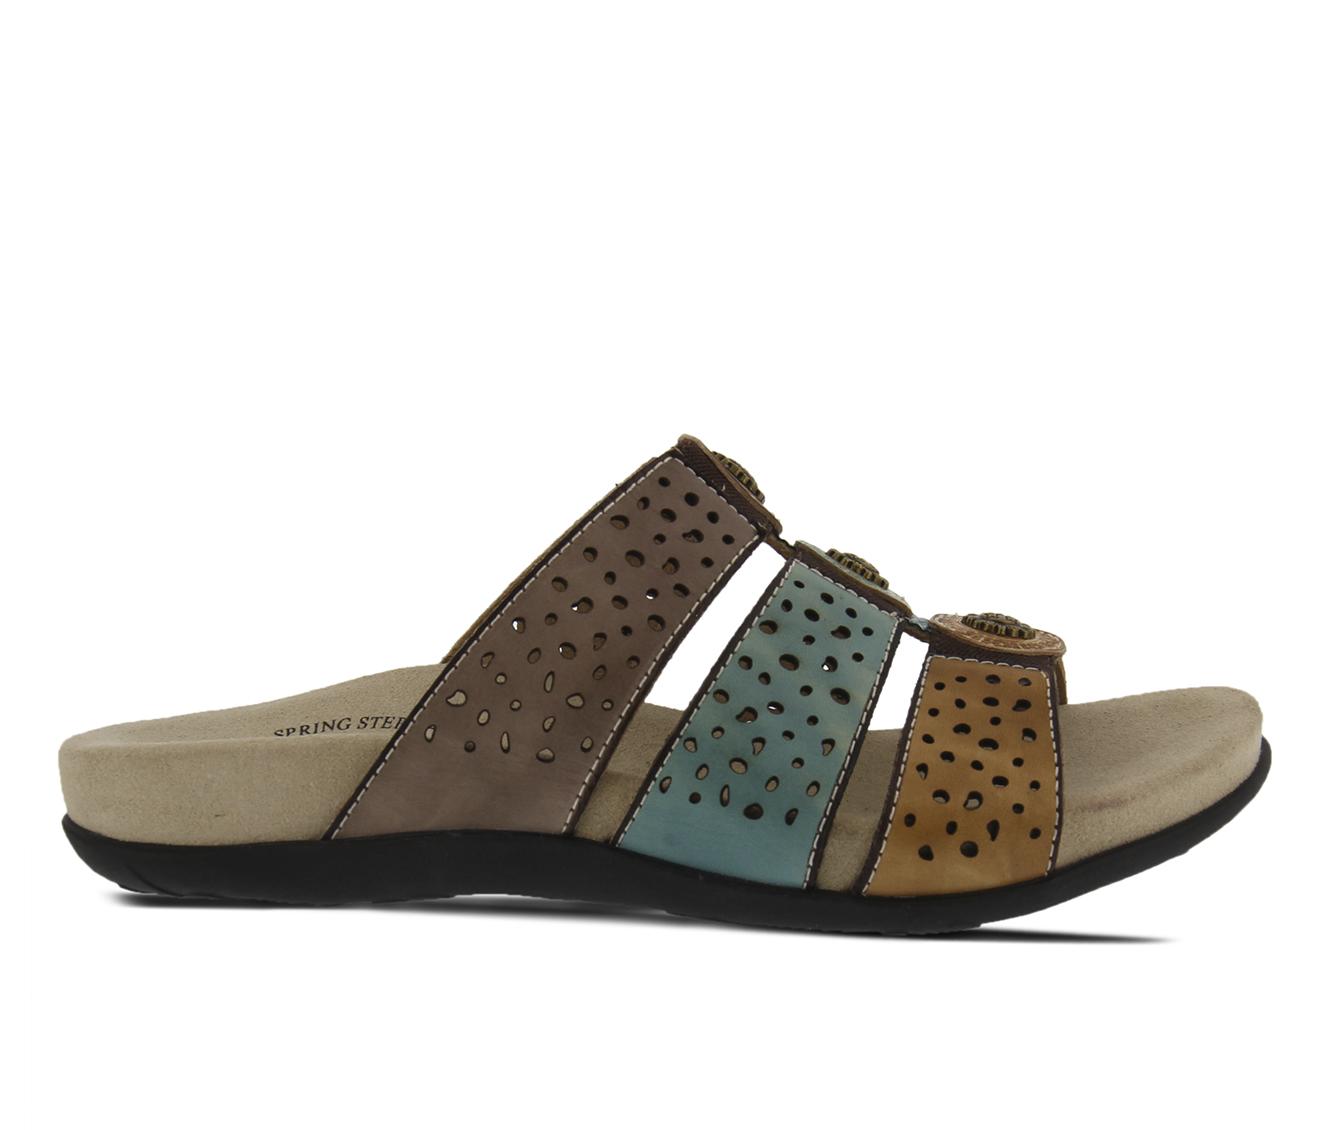 L'Artiste Glennie Women's Sandal (Gray Leather)